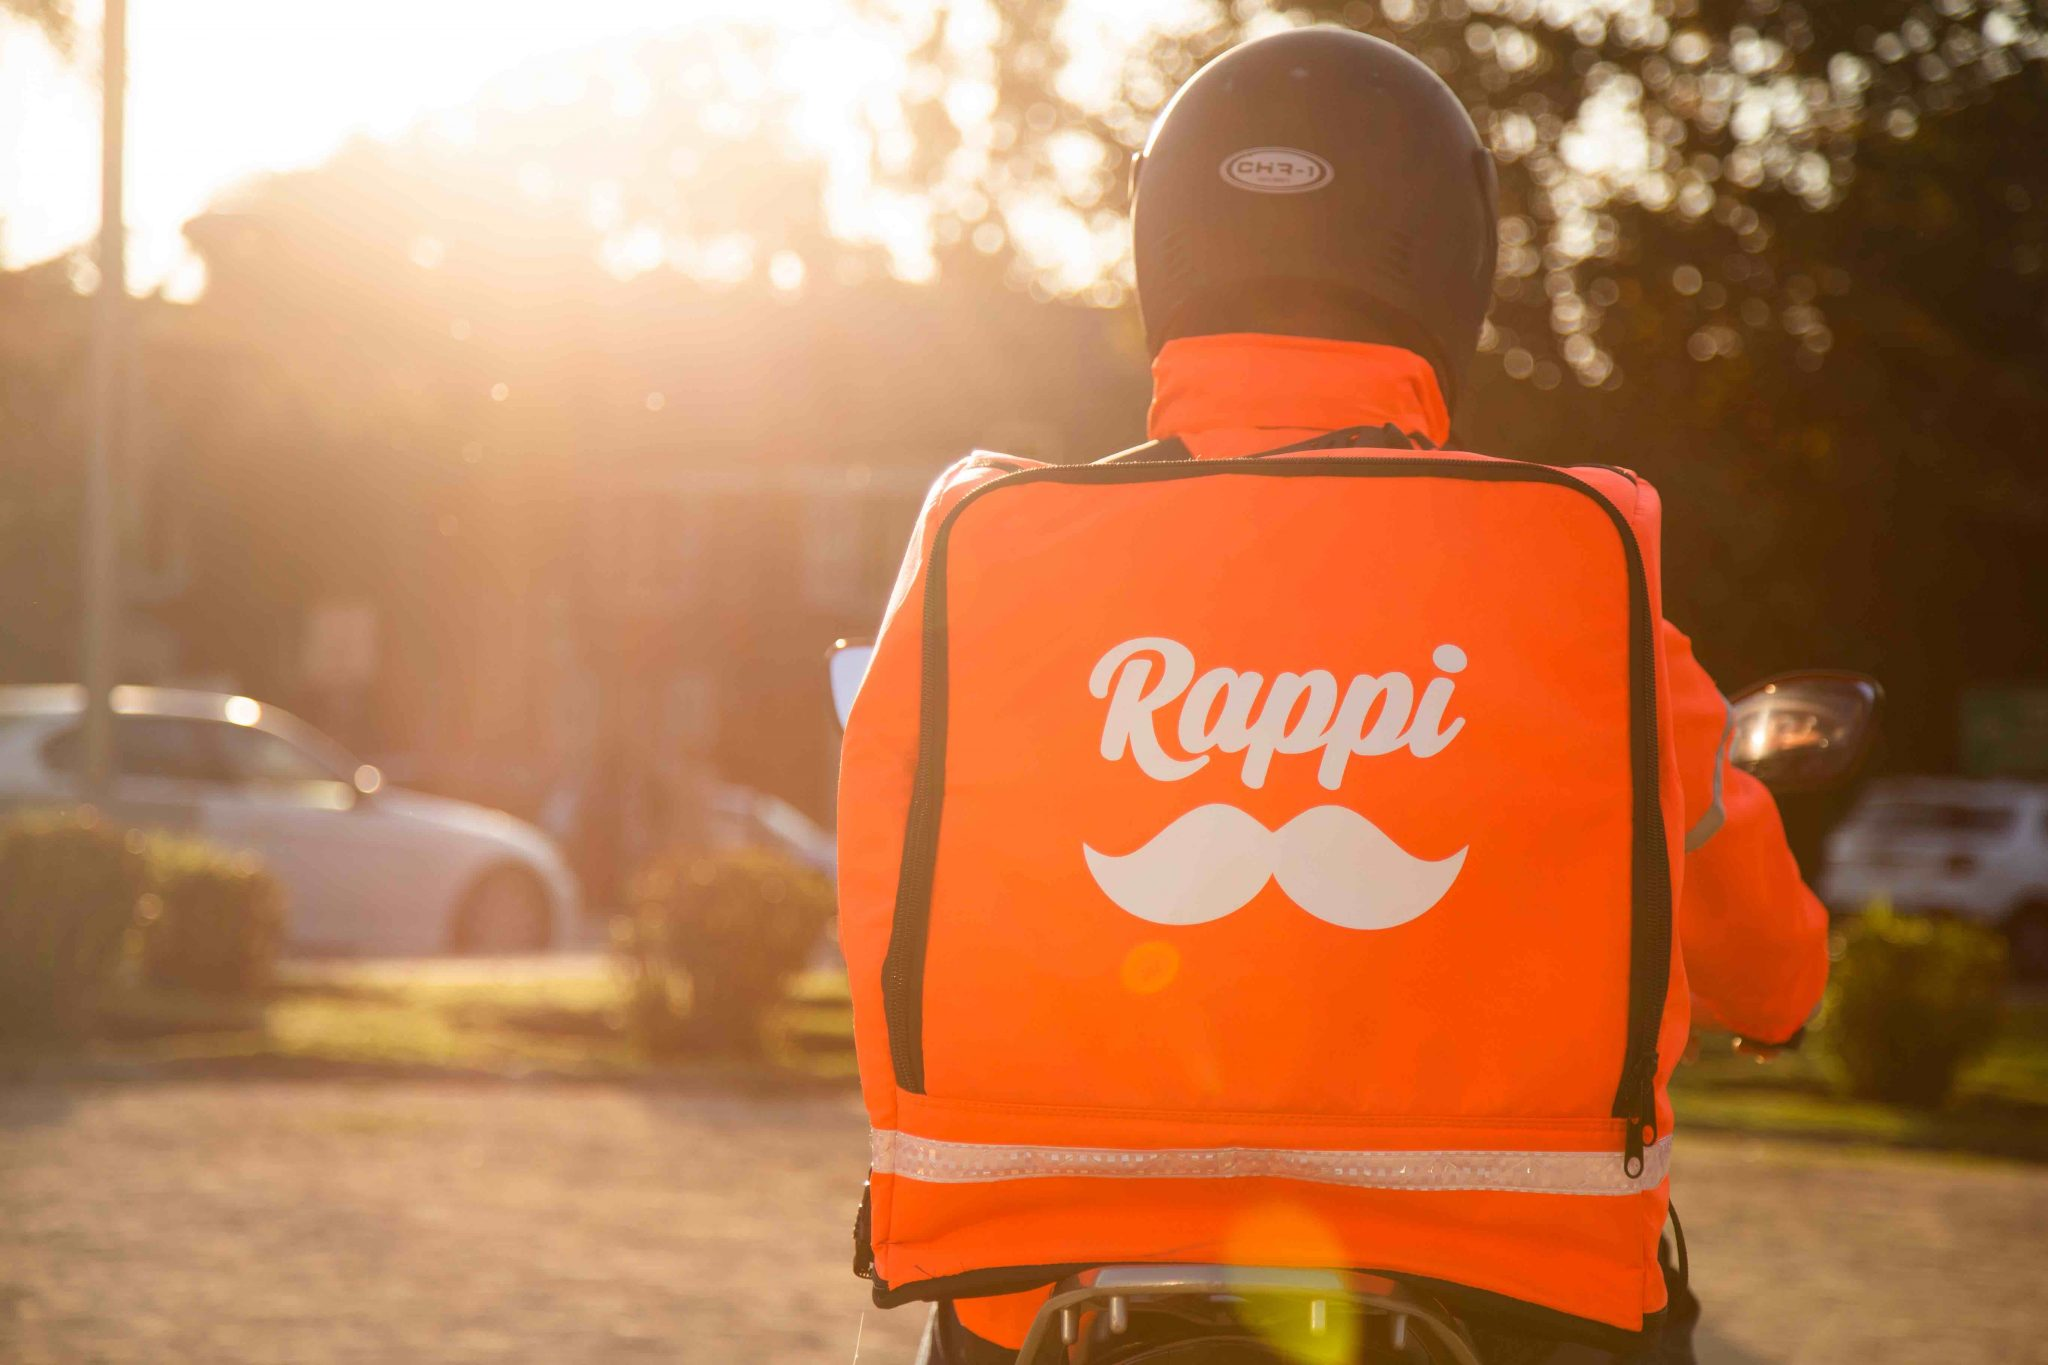 Rappi llega a Rancagua con su súper app